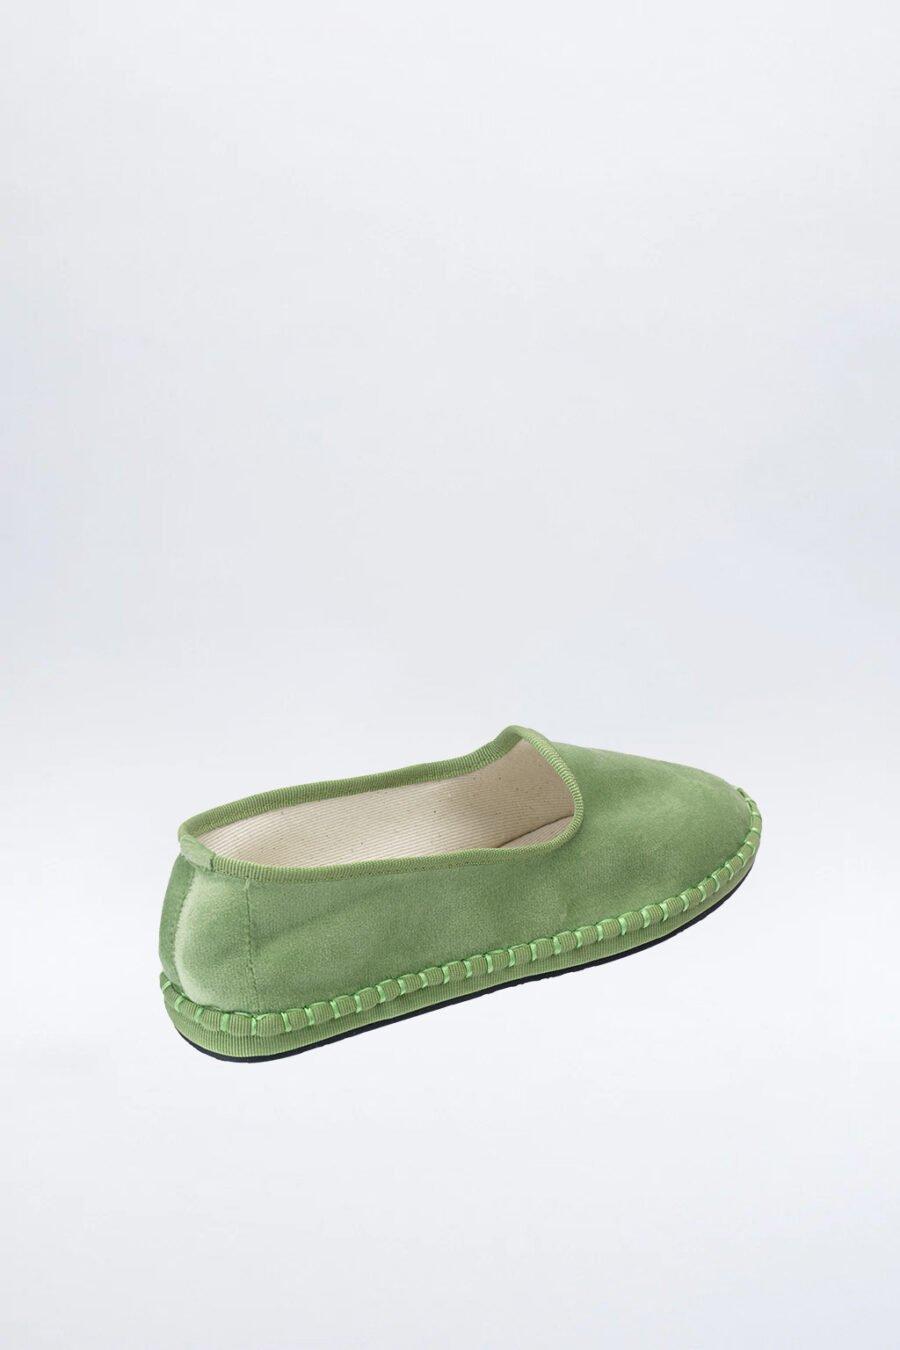 Friulane Light Green